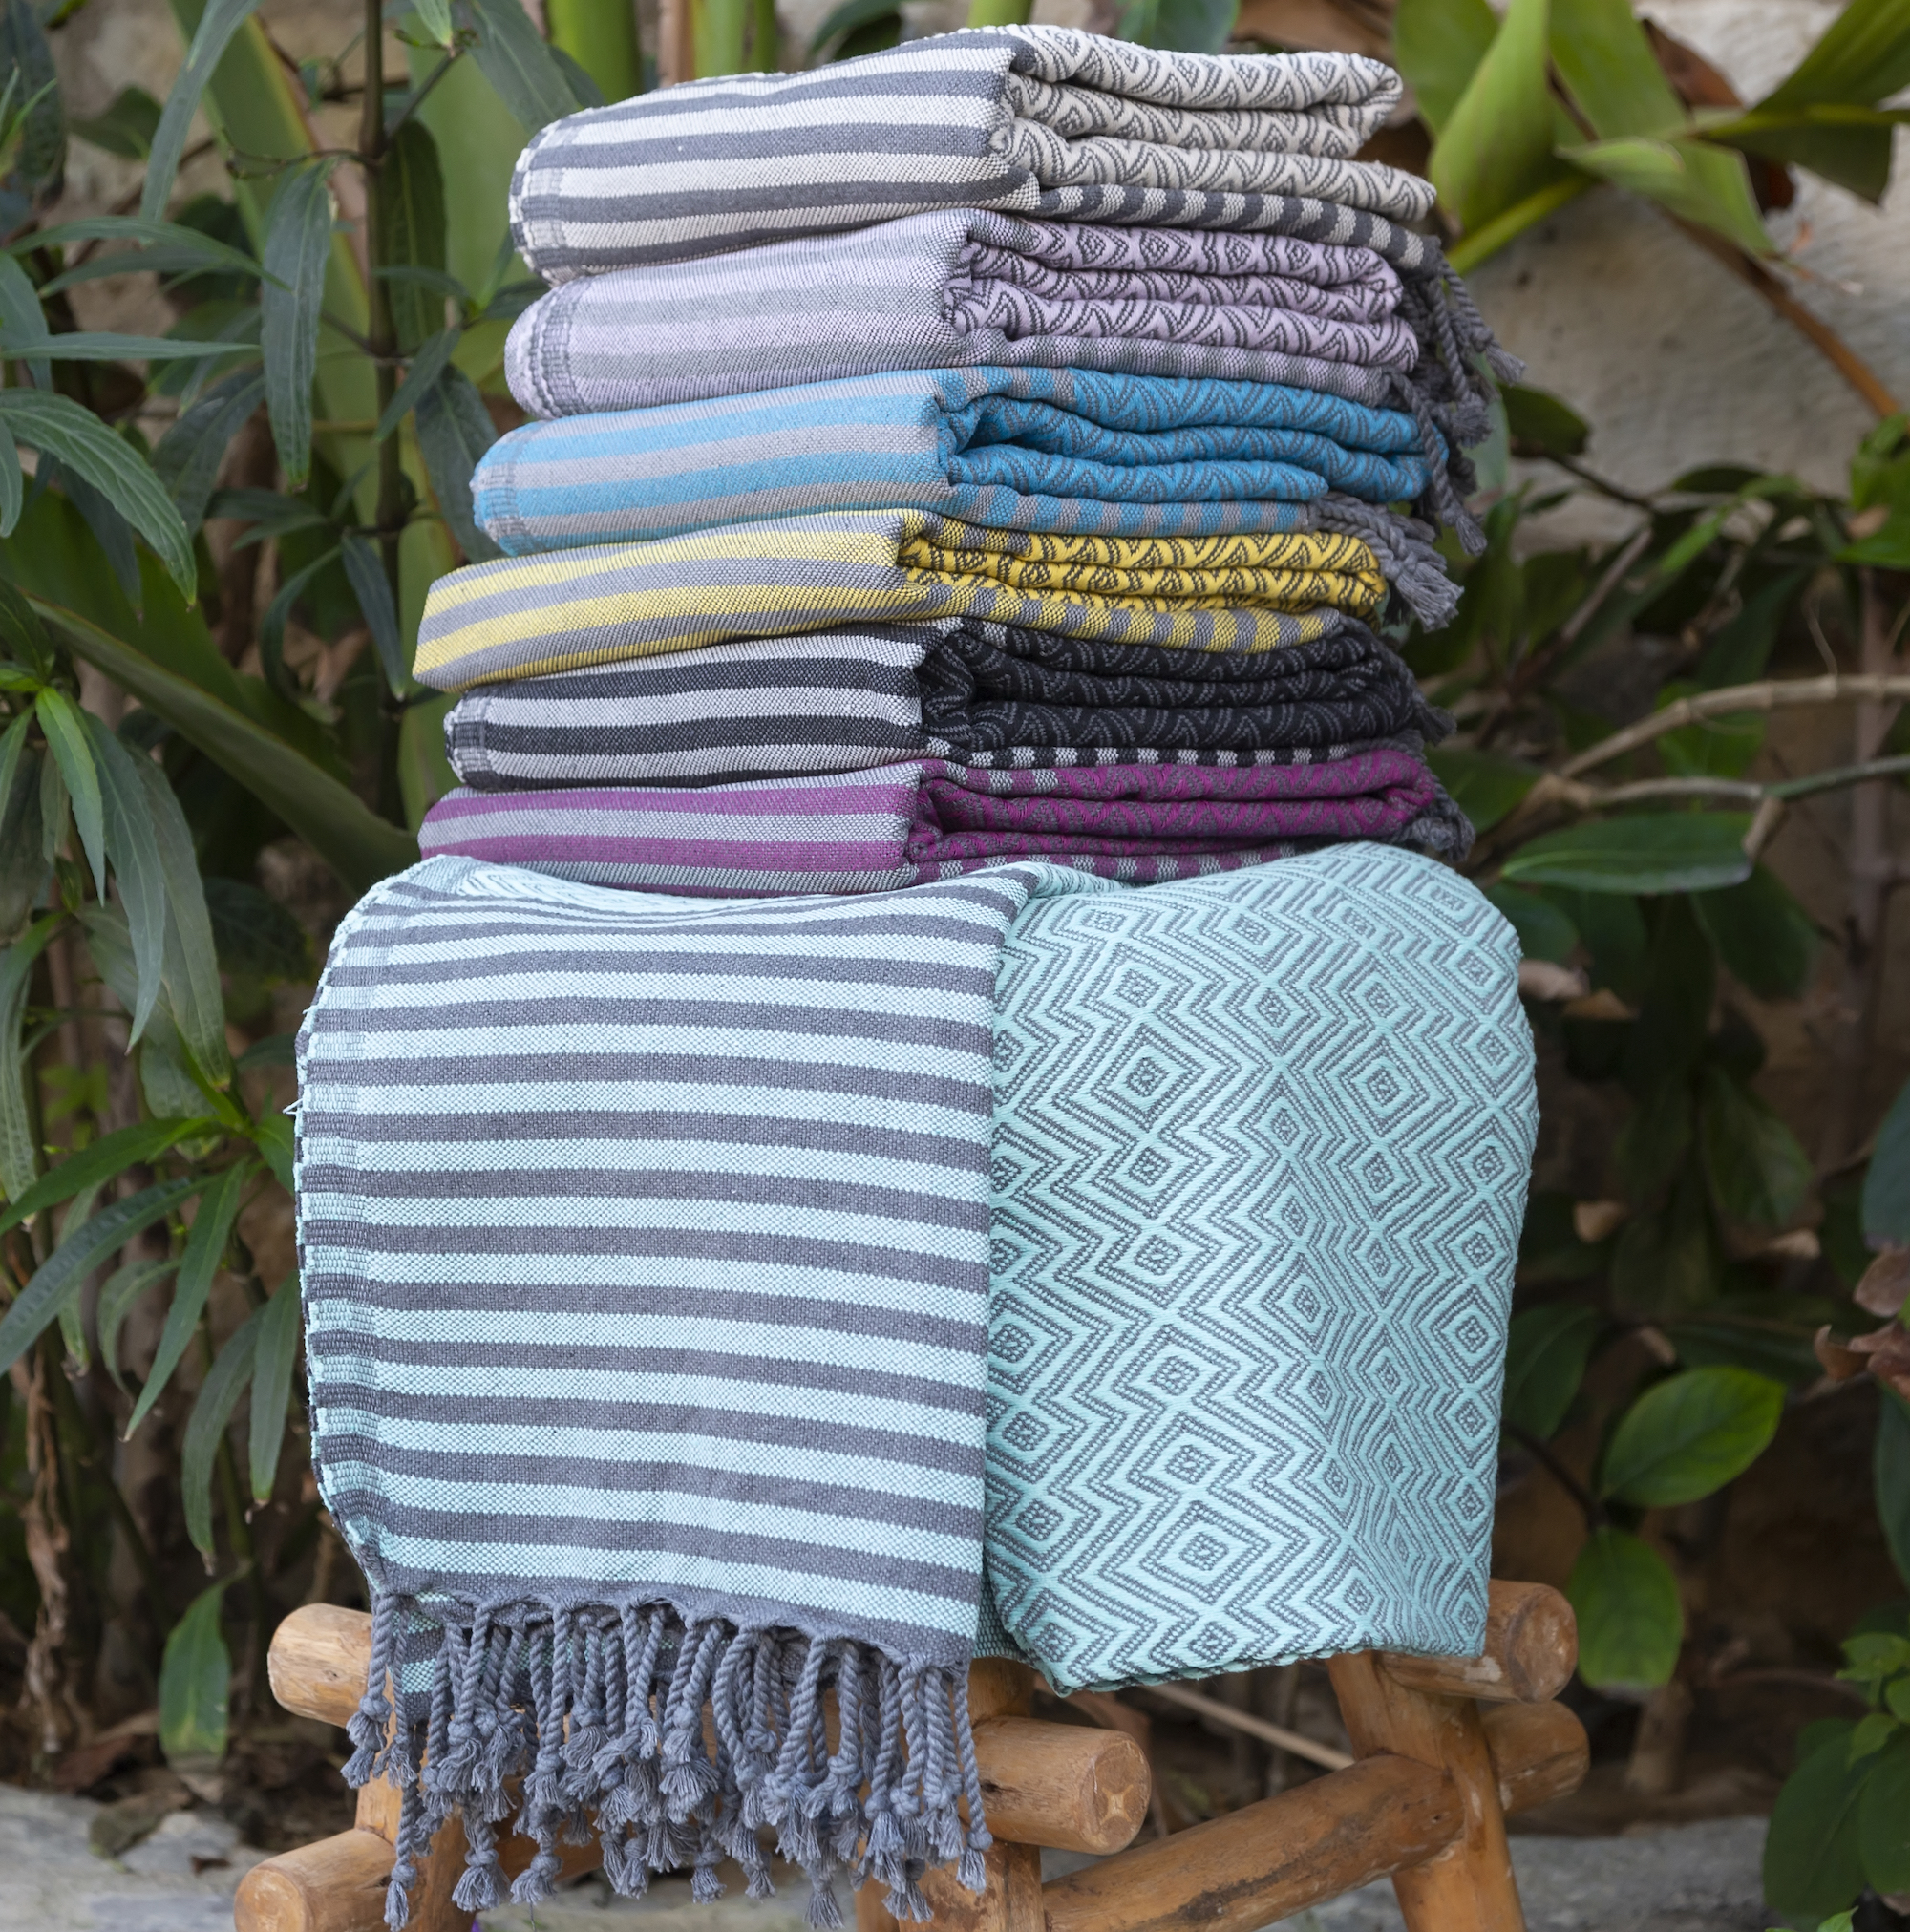 Hammam Towel in Mint Green & Grey